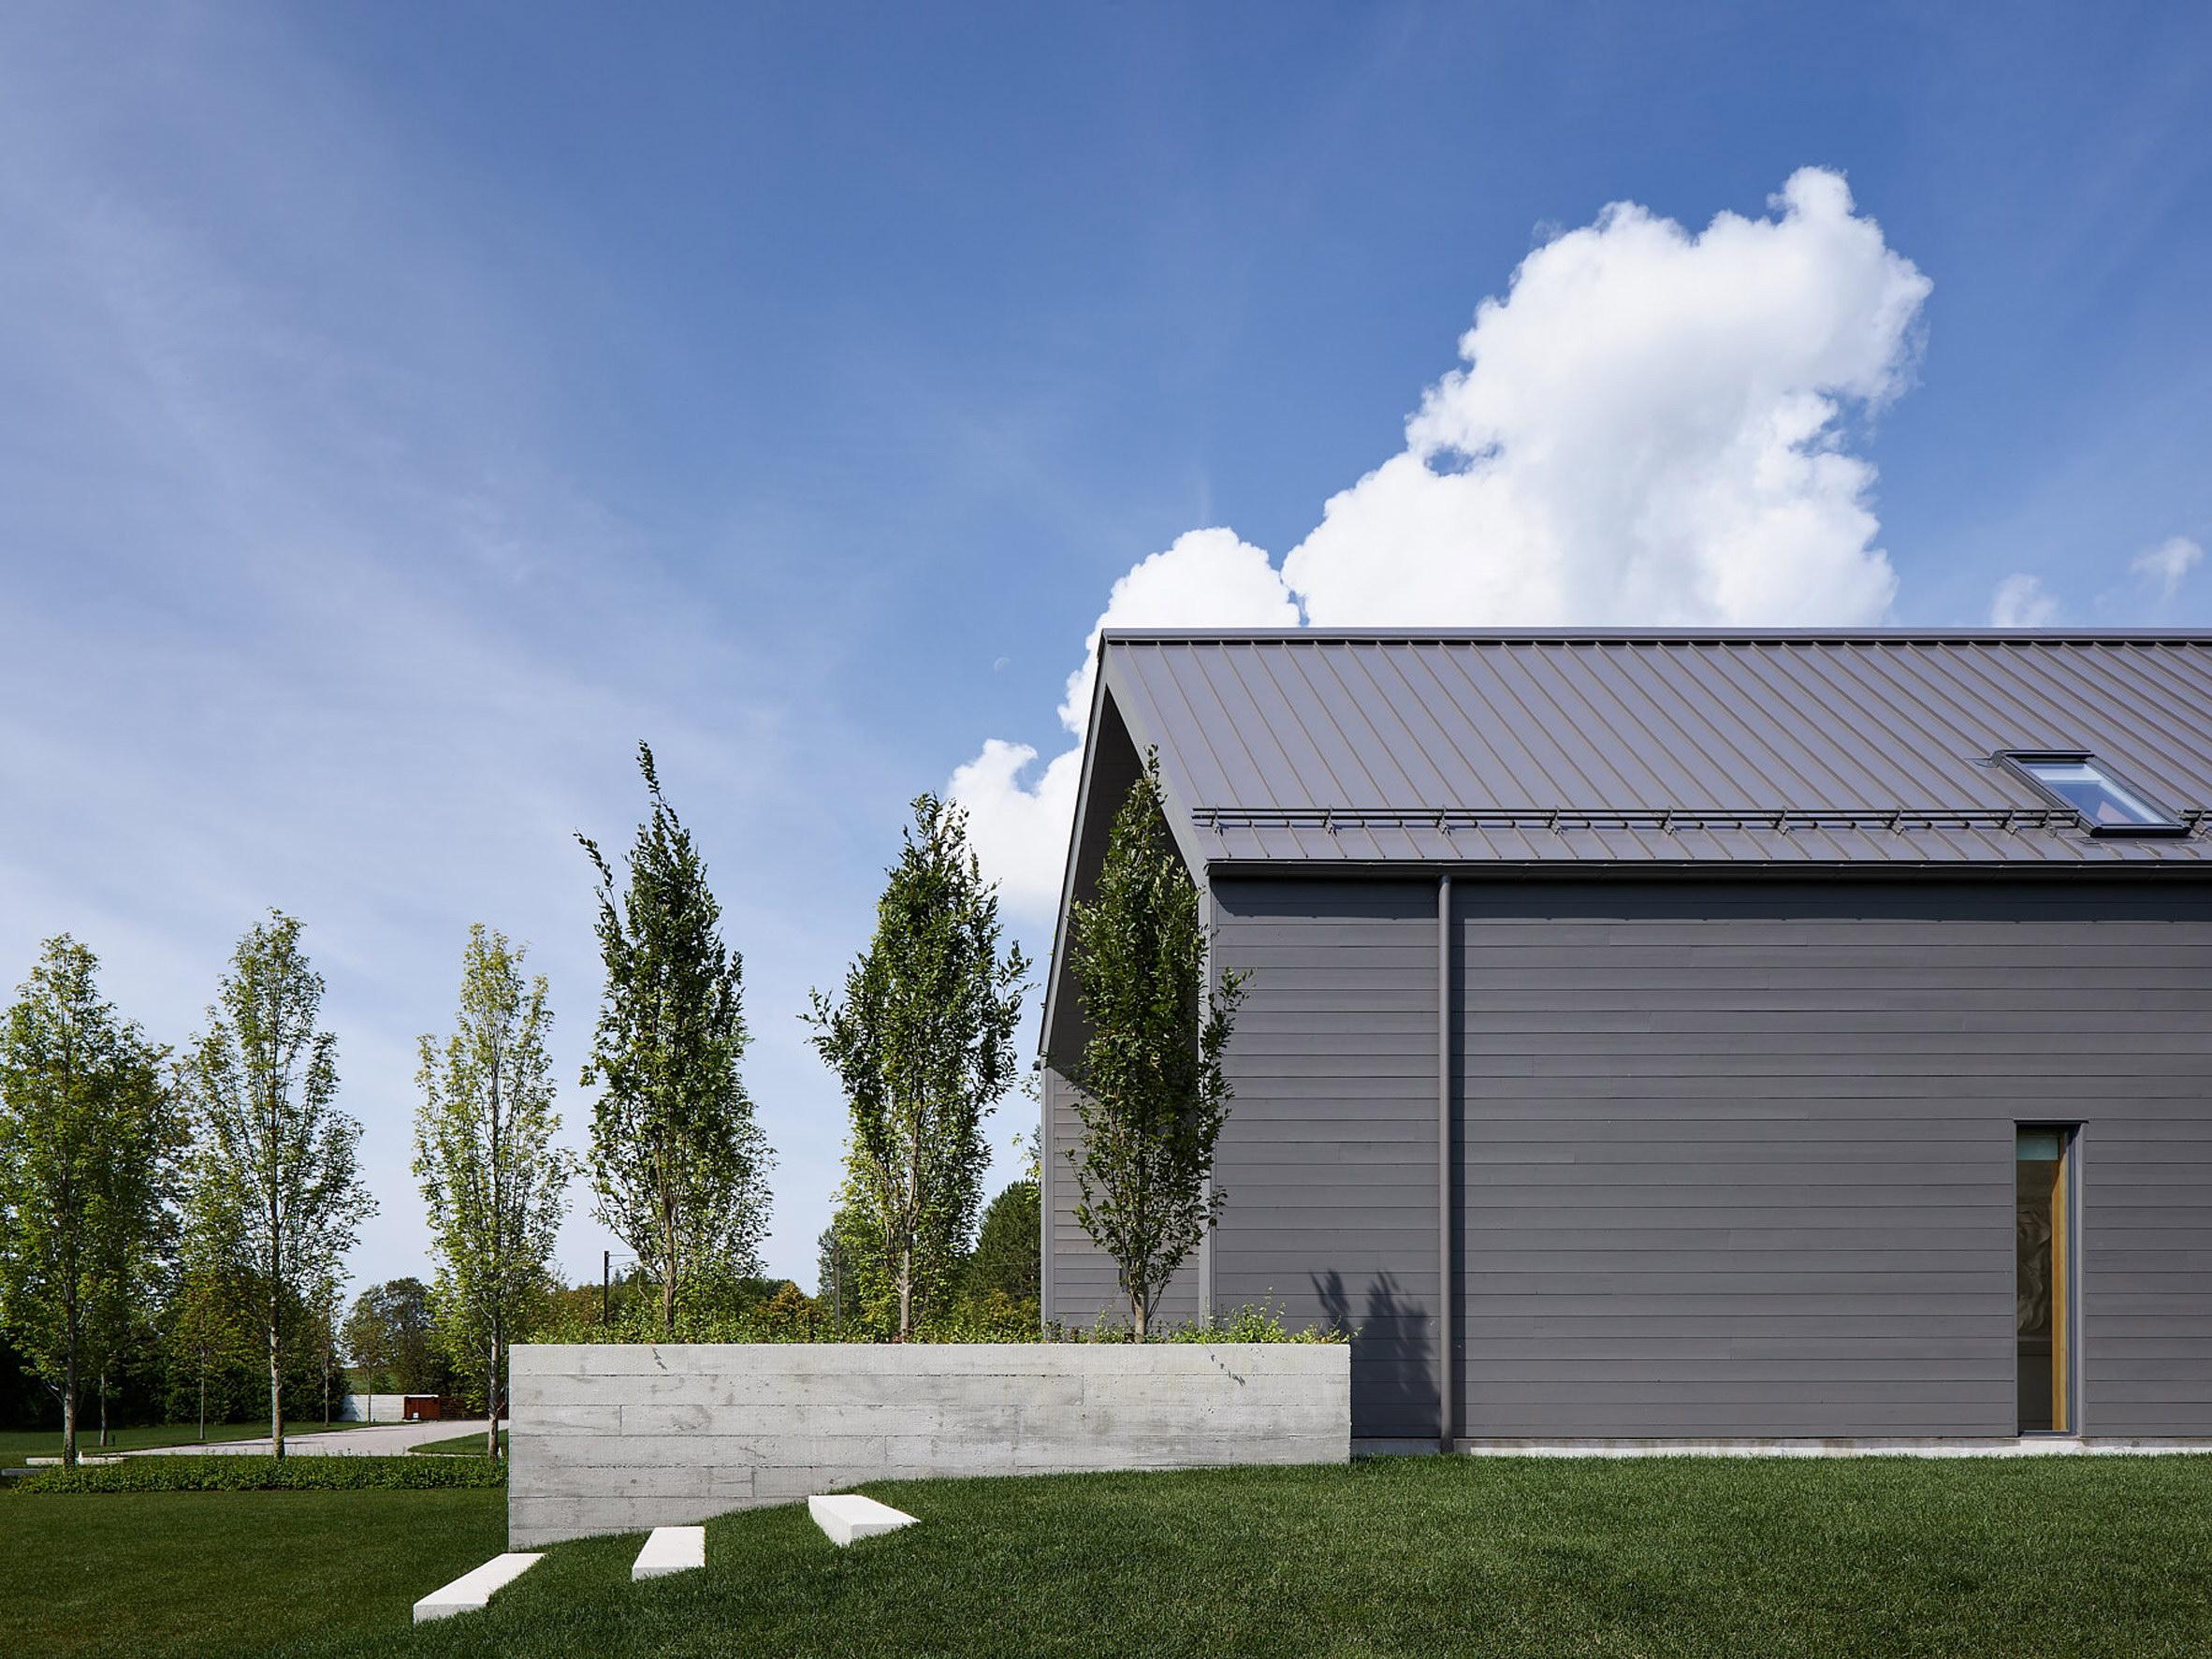 The Farm | Country Home by Scott Posno Design